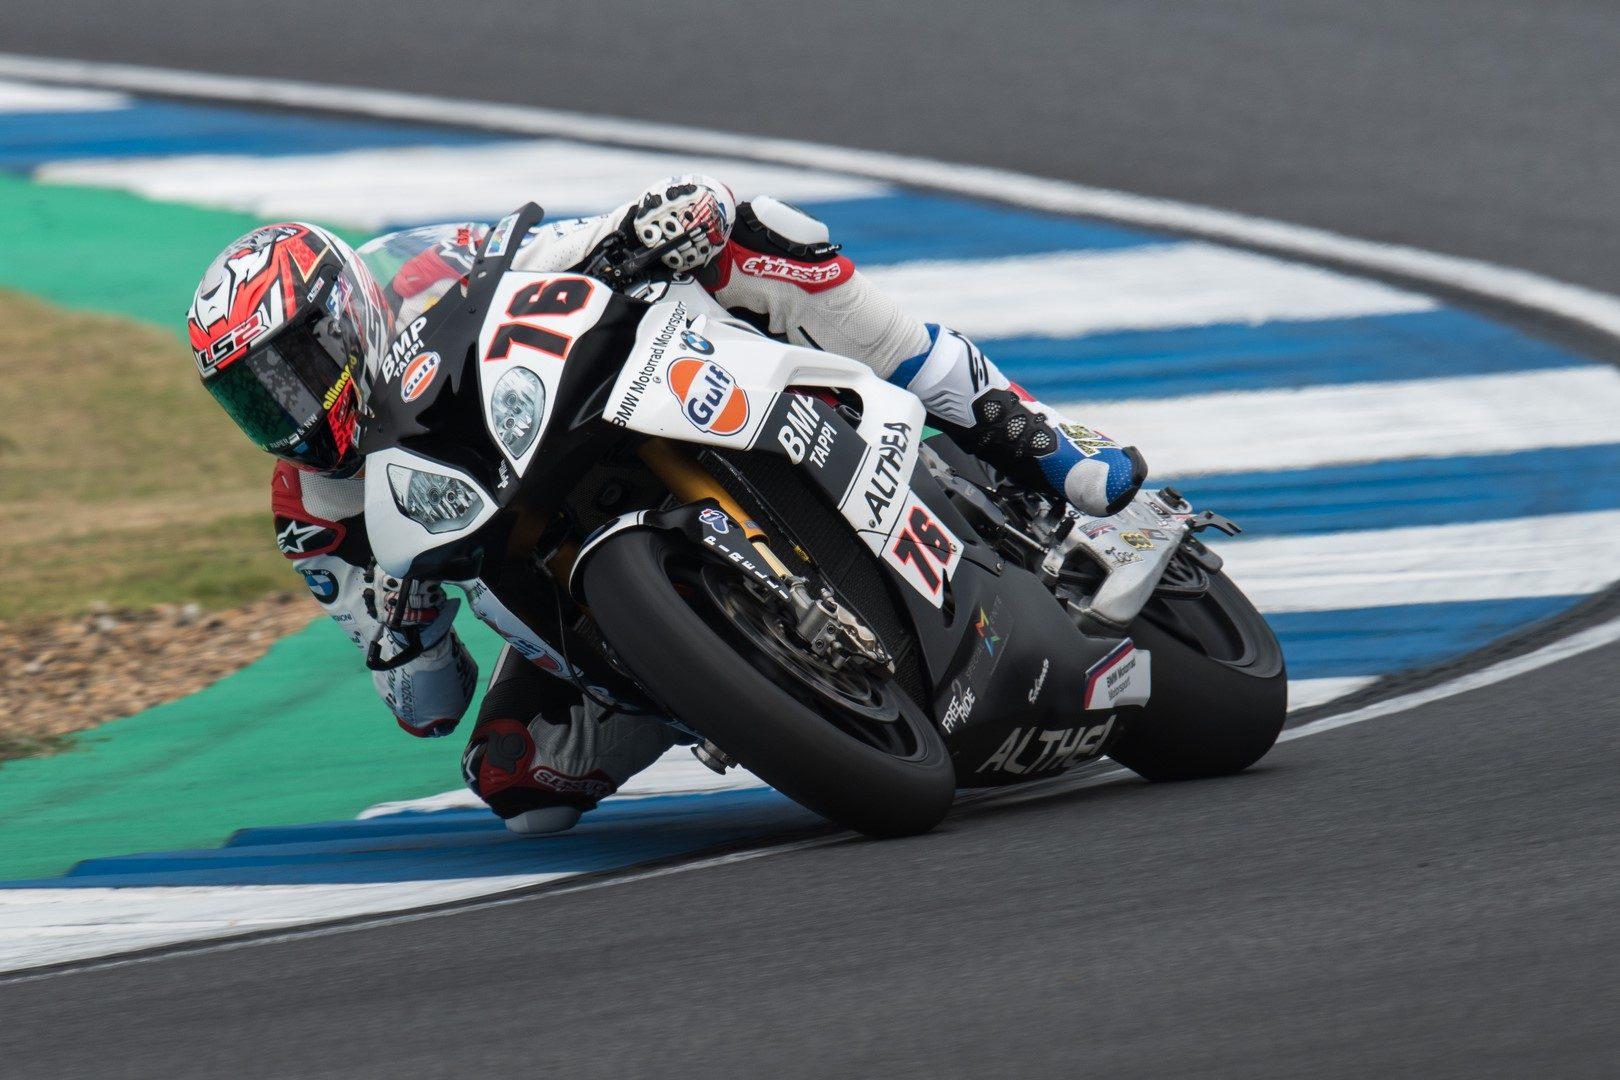 MotoGP – Loris Baz replaces Pol Espargaró at Silverstone